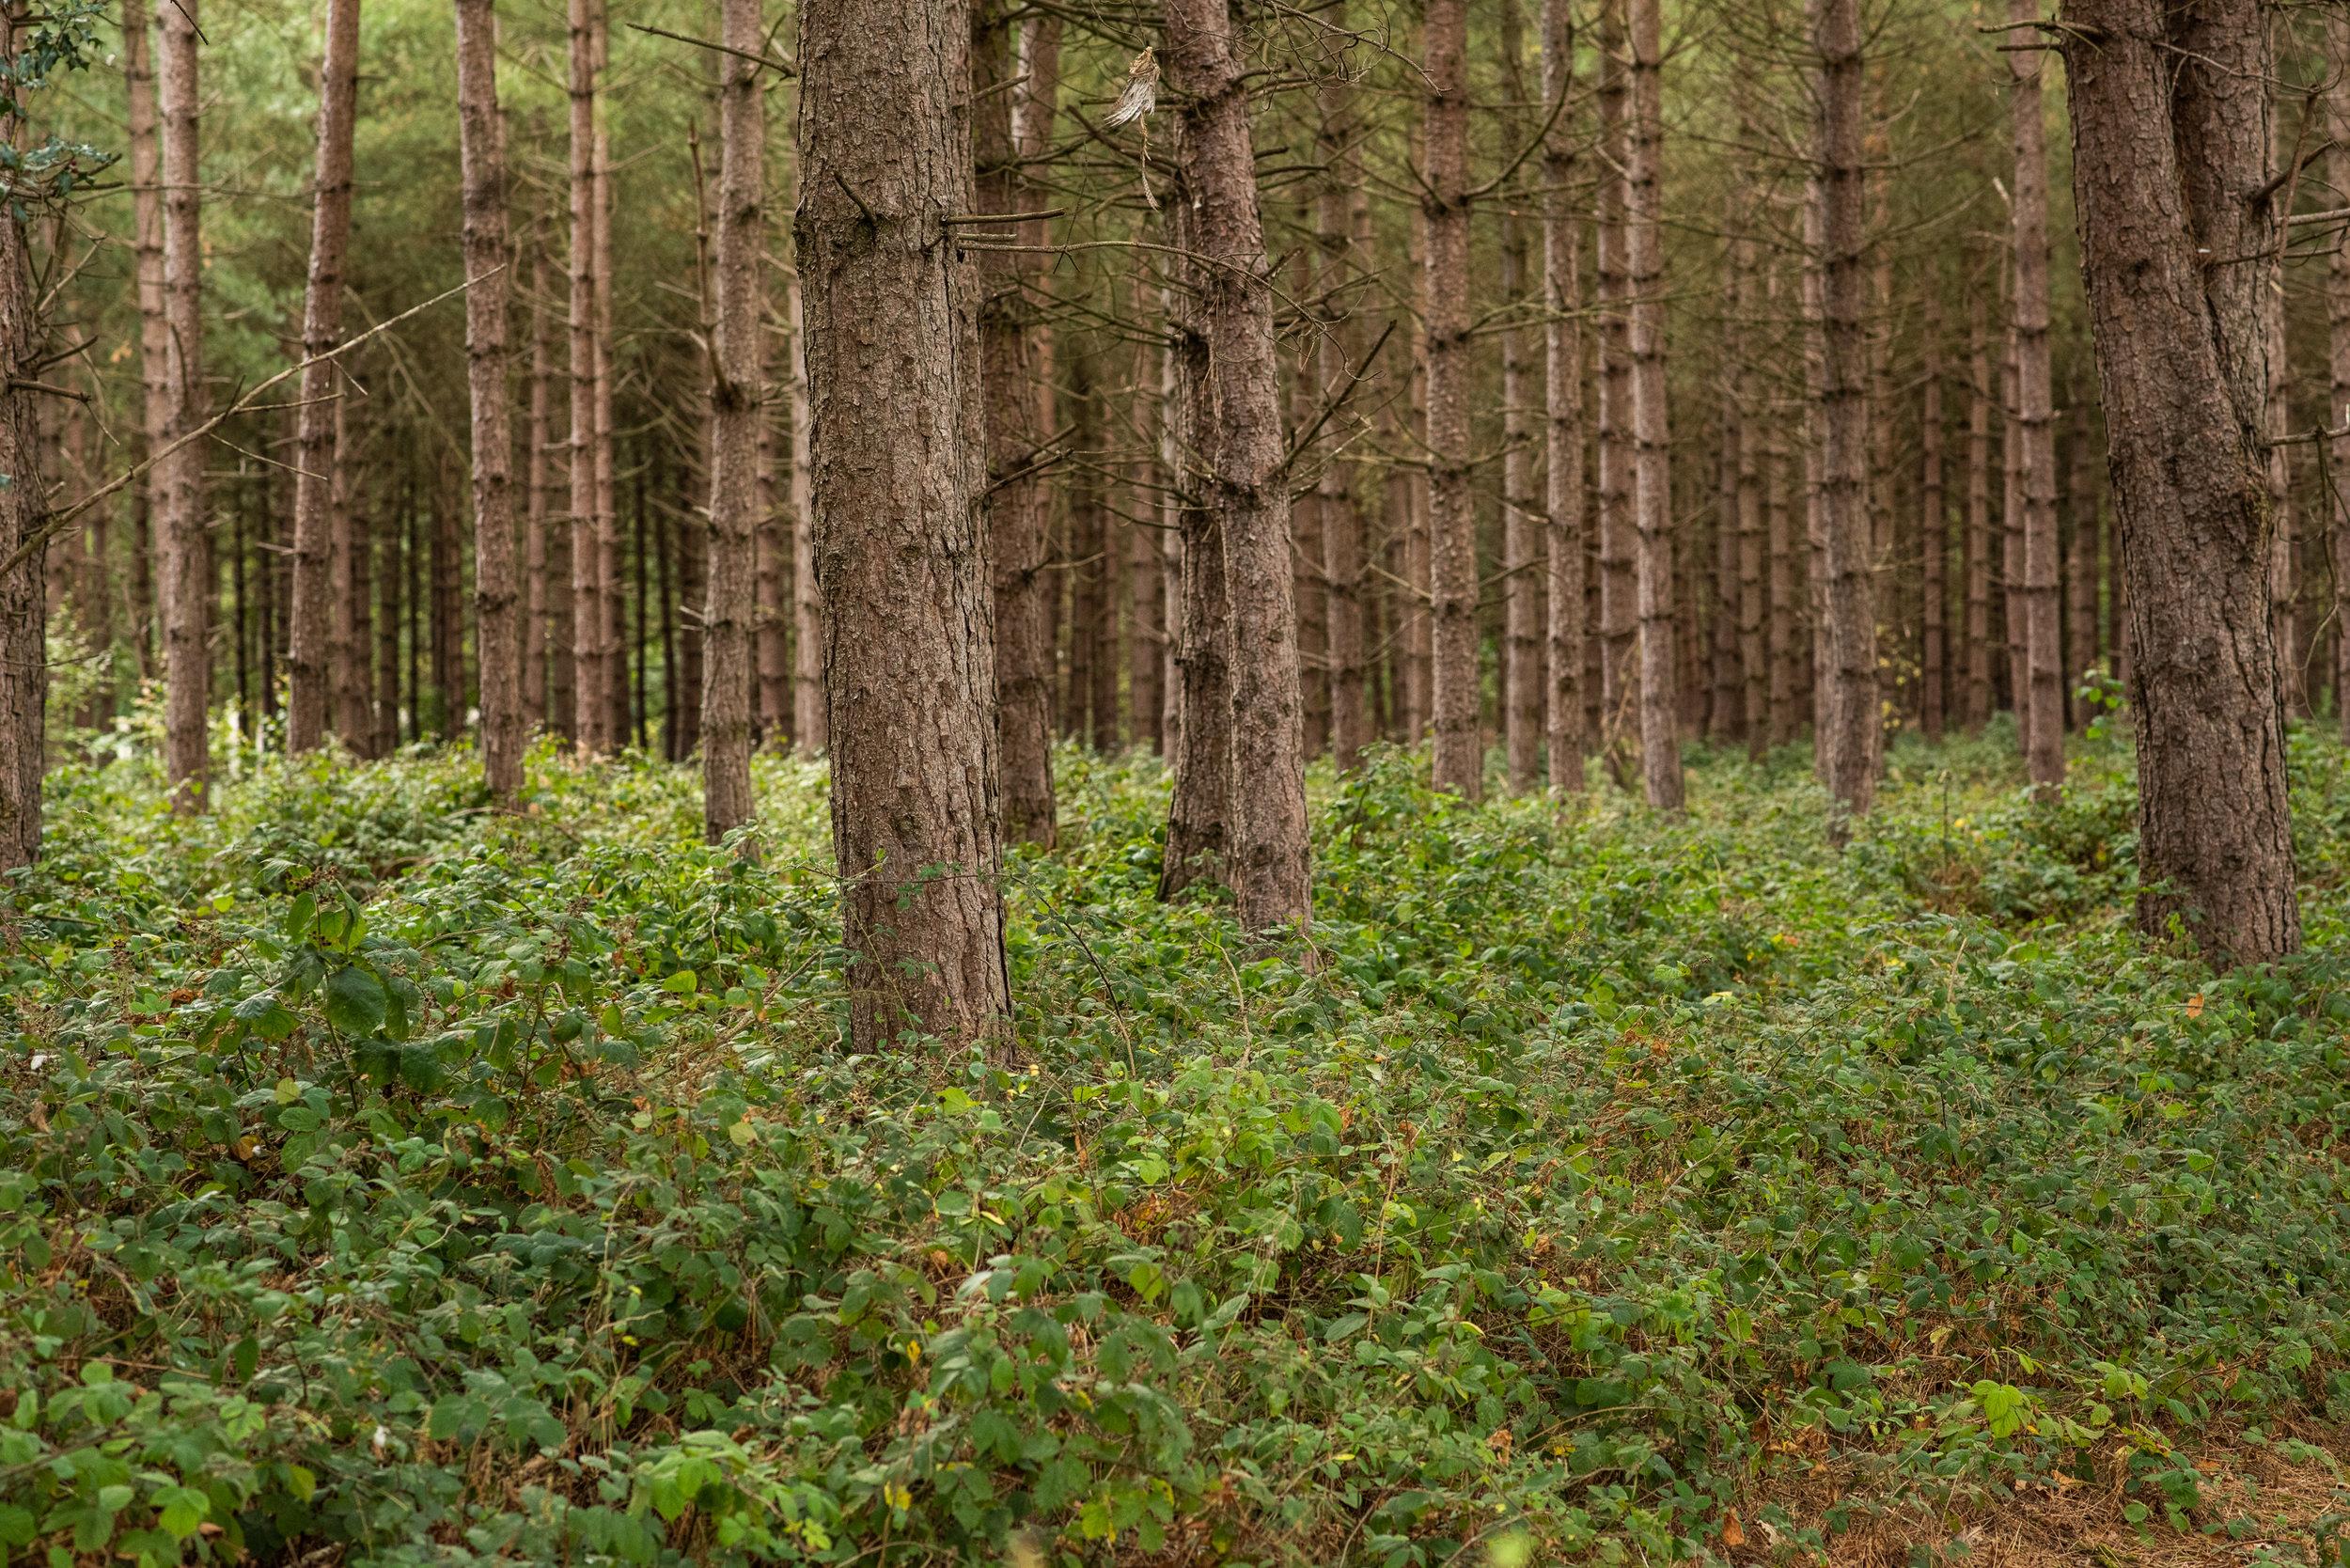 Private Wood, Midlands, 2018